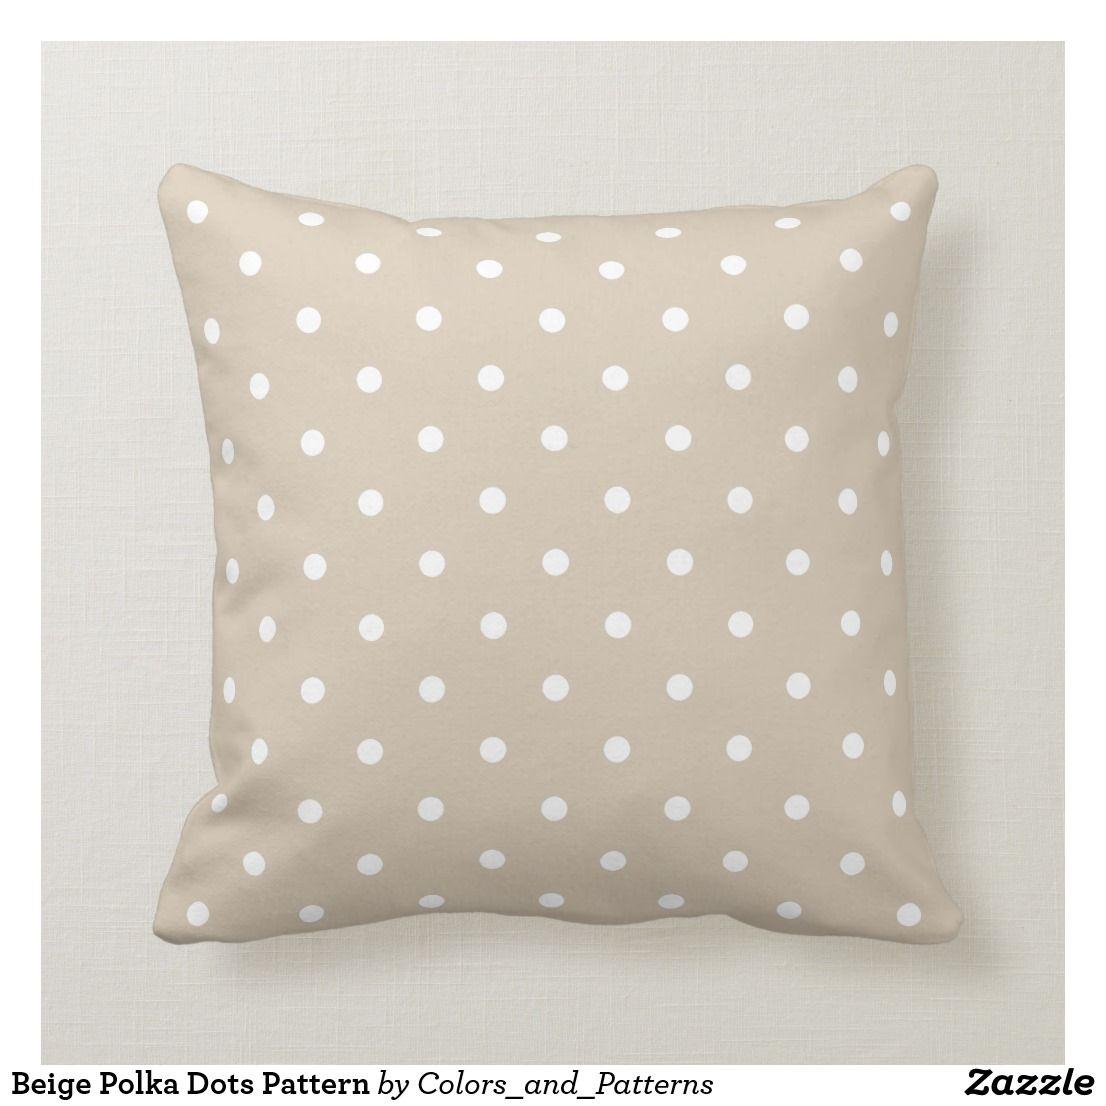 Beige Polka Dots Pattern Throw Pillow Beige Pillows Patterned